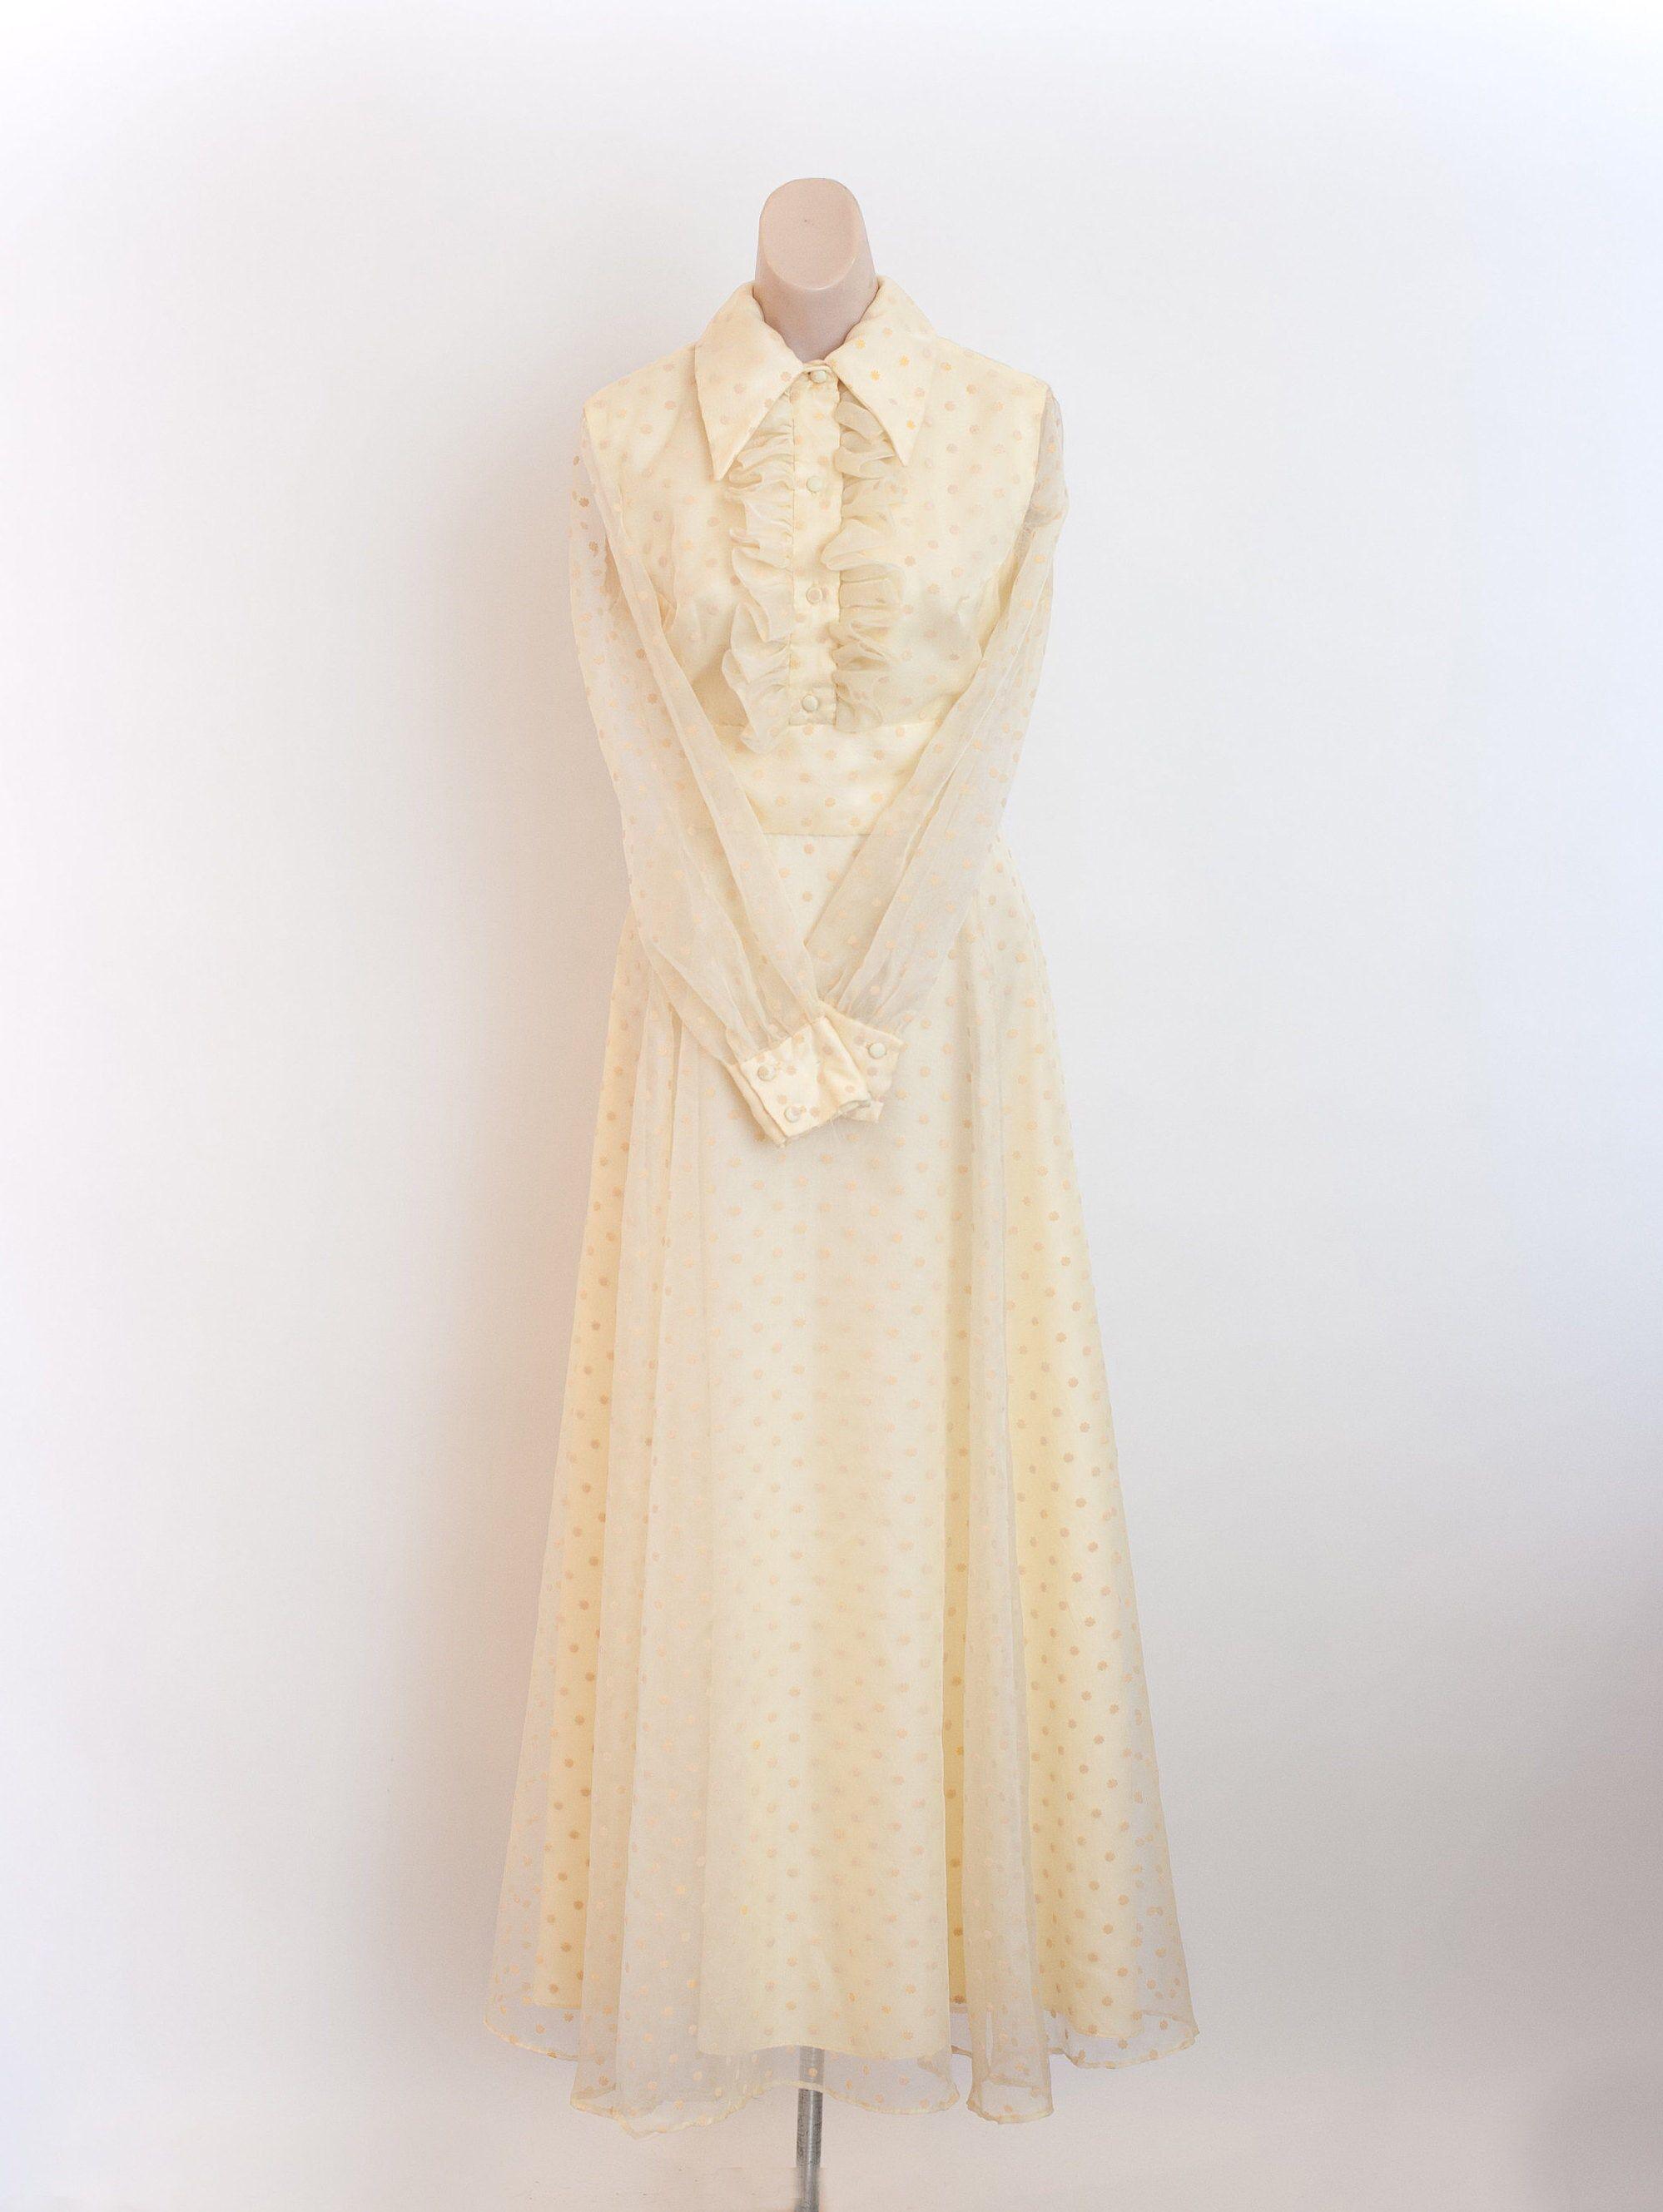 Vintage 1970s Yellow Maxi Dress 70s Dress 60s Formal Dress Etsy Yellow Maxi Dress 70s Dress Dresses [ 2658 x 1998 Pixel ]